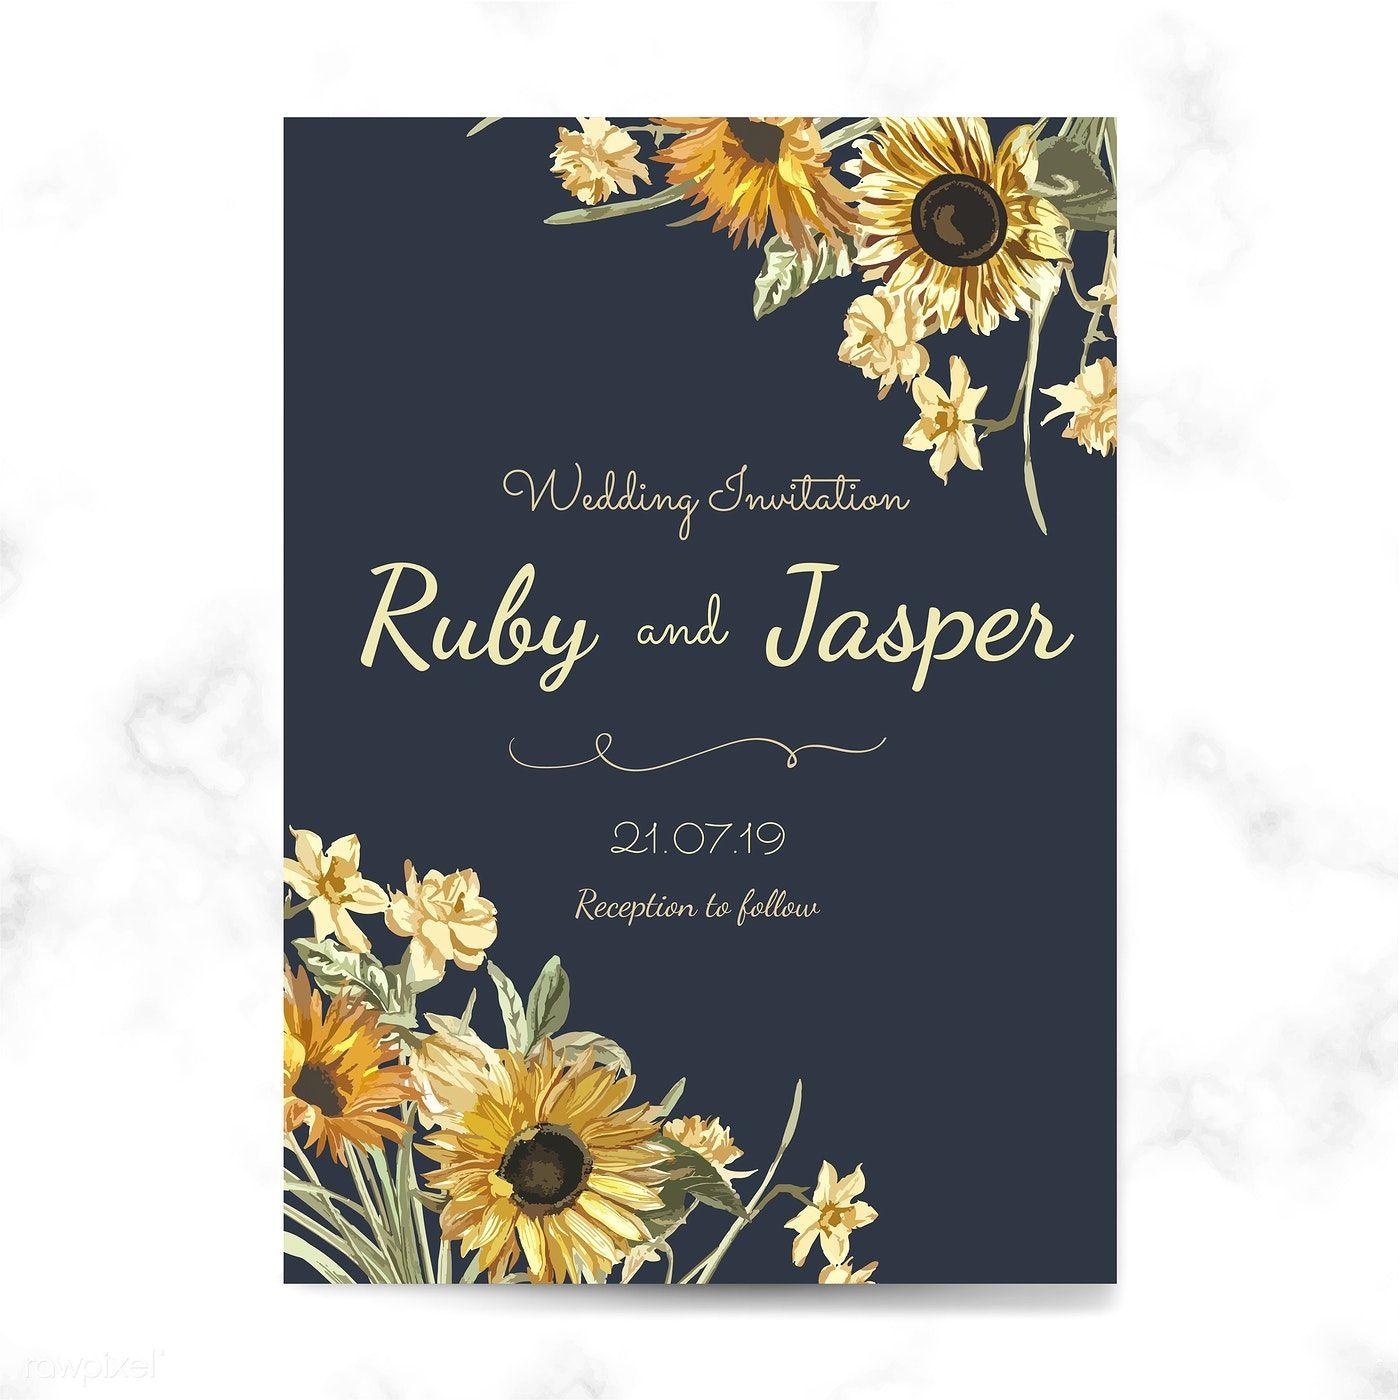 Wedding invitation card mockup vector free image by